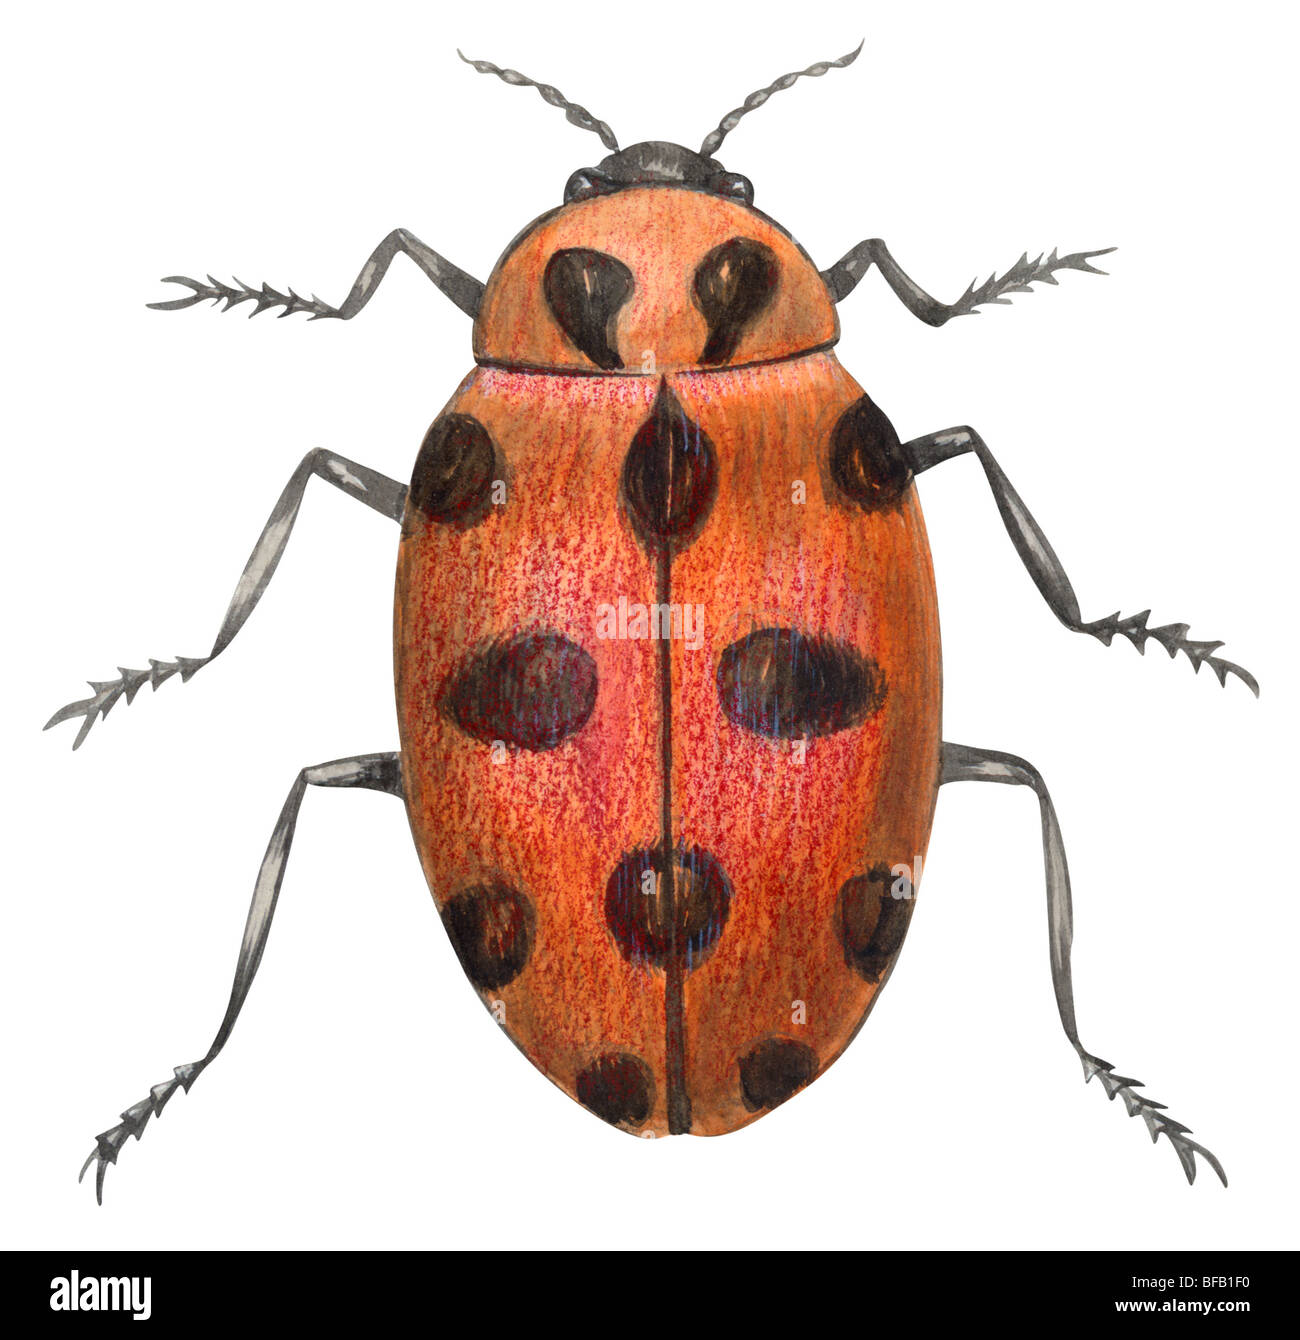 Twelve-spotted ladybird - Stock Image